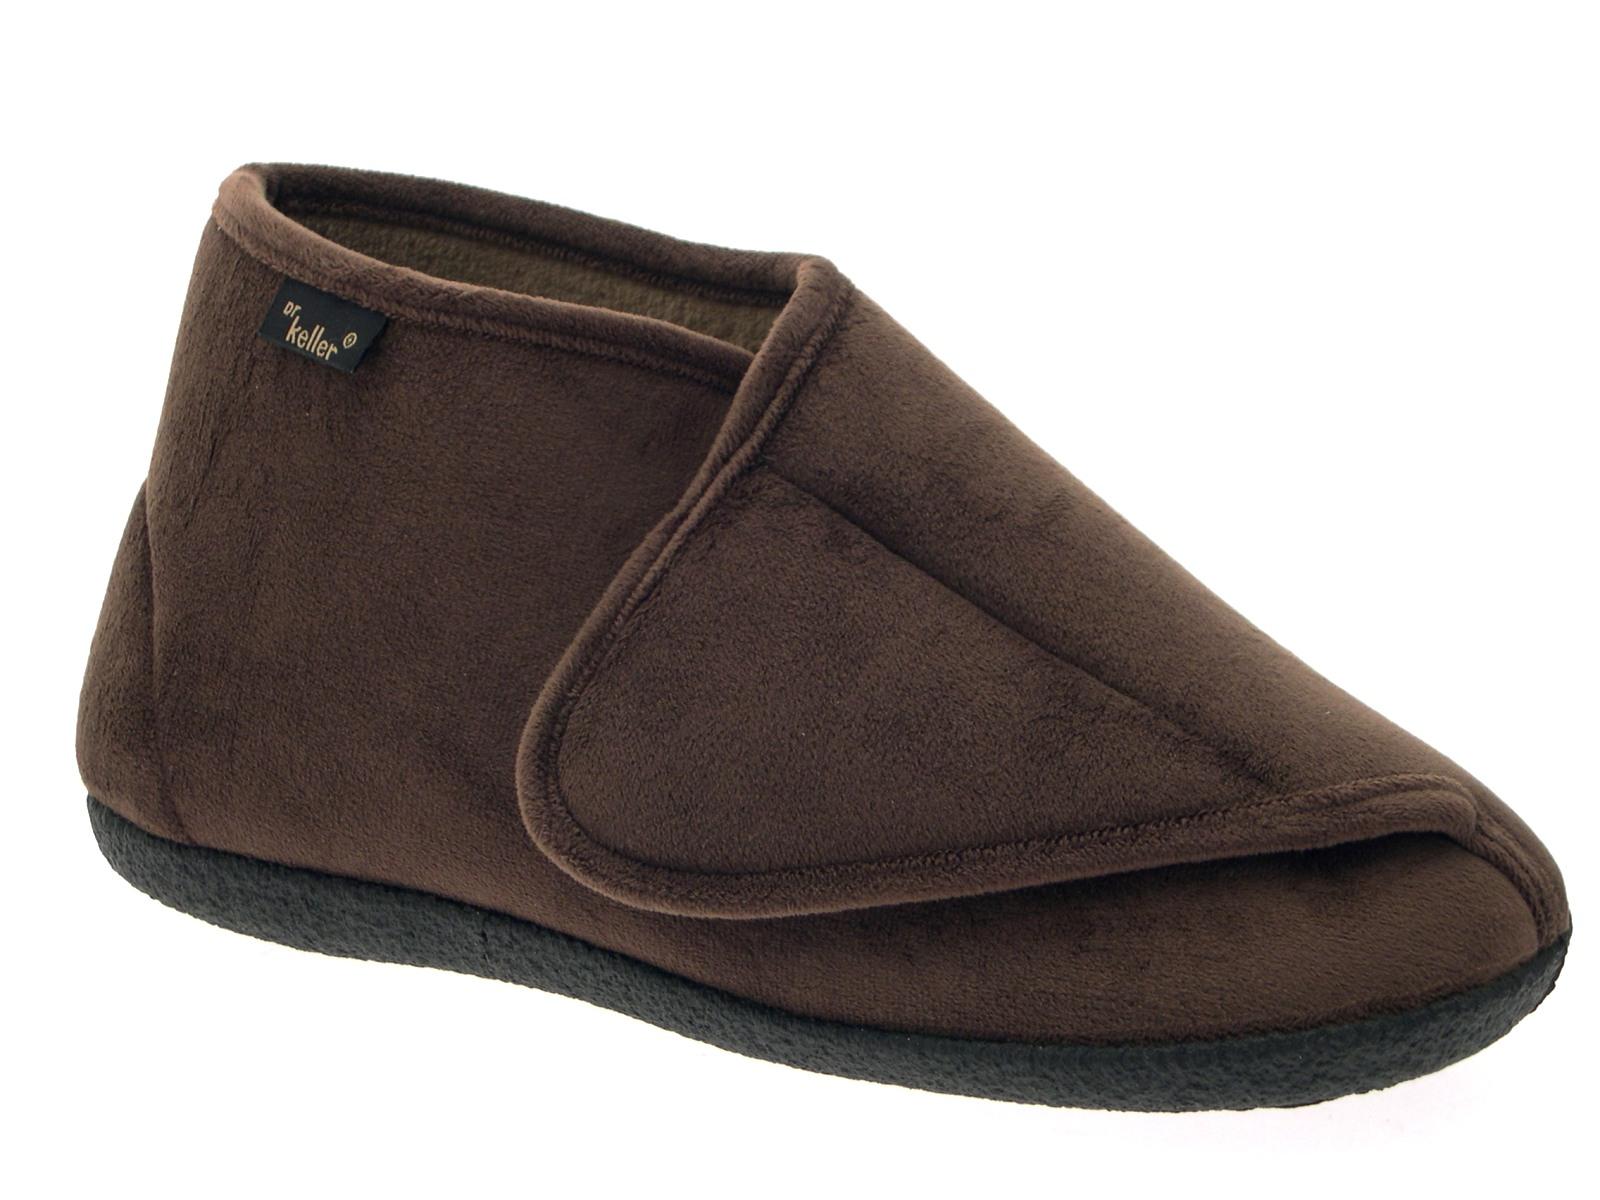 Mens Diabetic Orthopaedic Comfort Slippers Boot Wide Cushioned Shoe Size UK 6